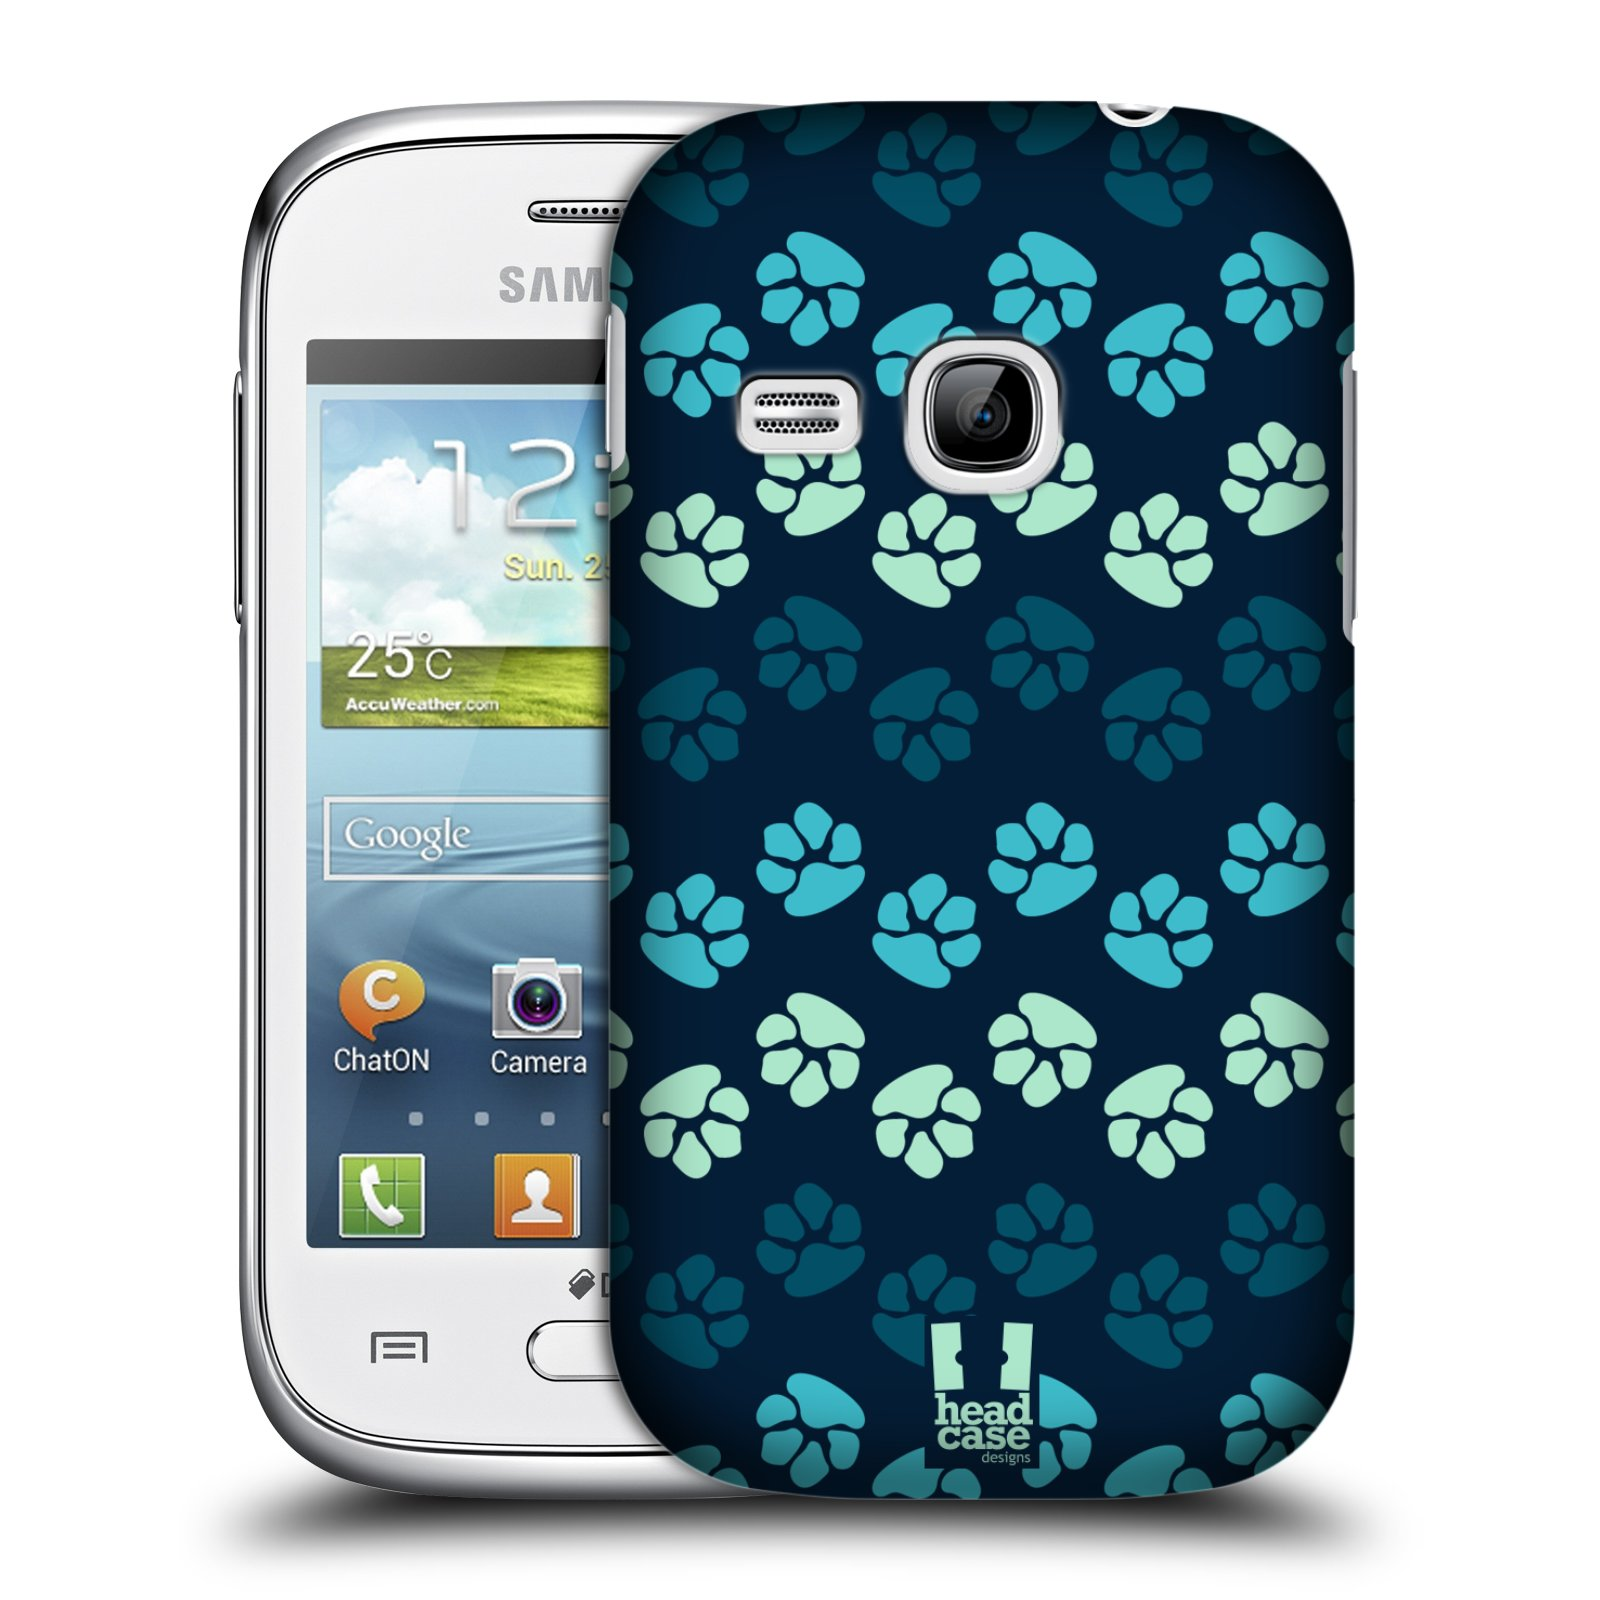 Pouzdra Samsung Plastov Pouzdro Na Mobil S6310 Galaxy Young New Head Case Tlapky Modr